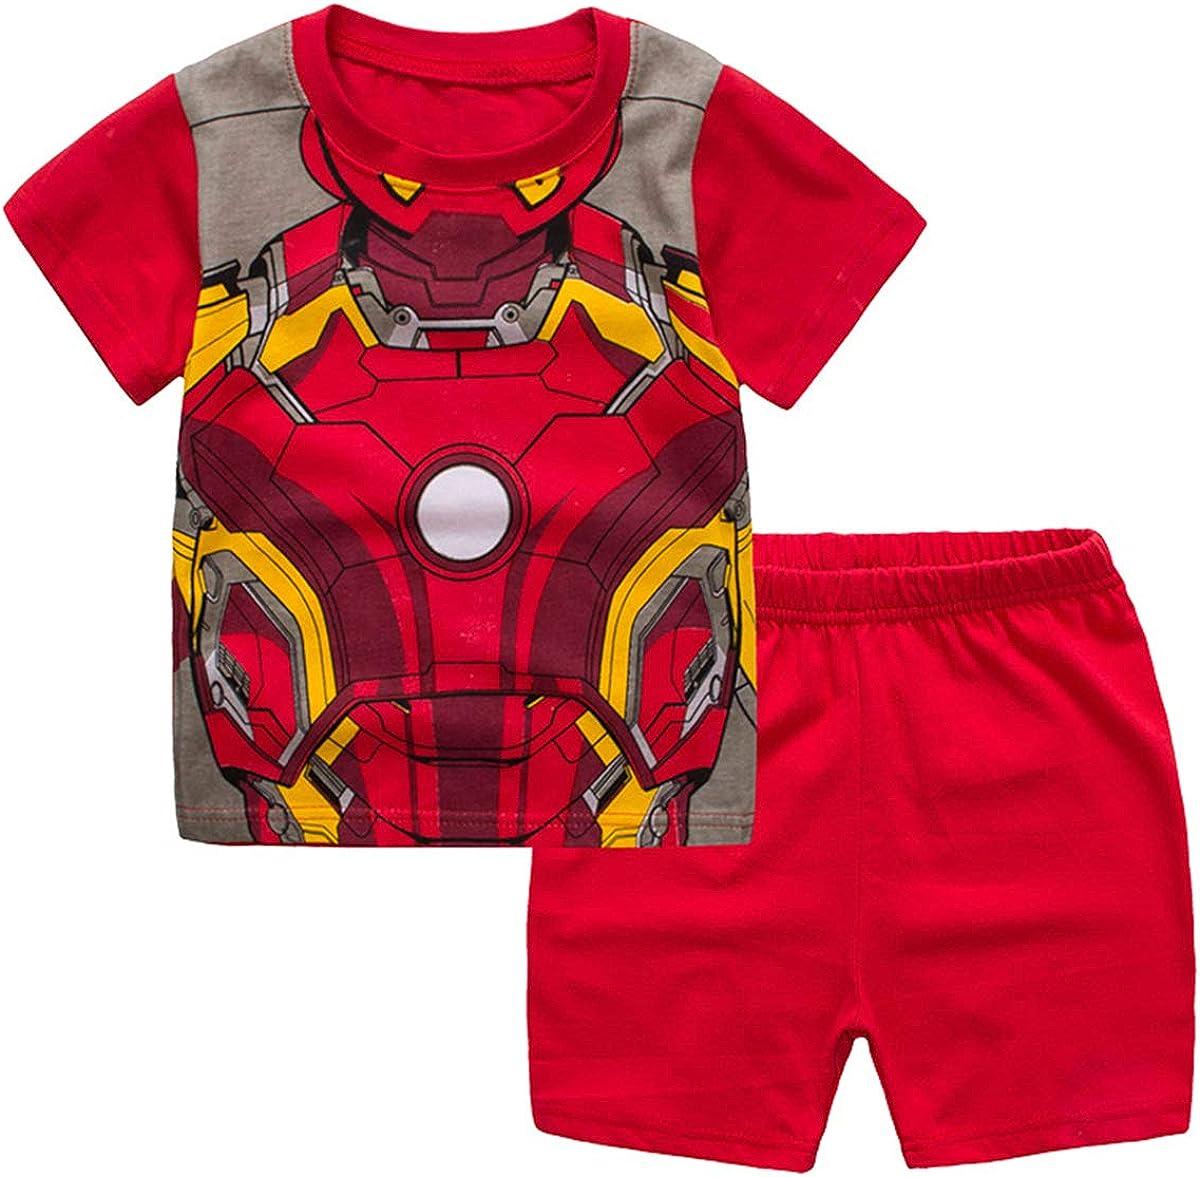 2T-7 ZooYi Iron Man Pajamas for Toddler-100/% Cotton Shorts Outfits Set-Little Boys Short Pajamas Set